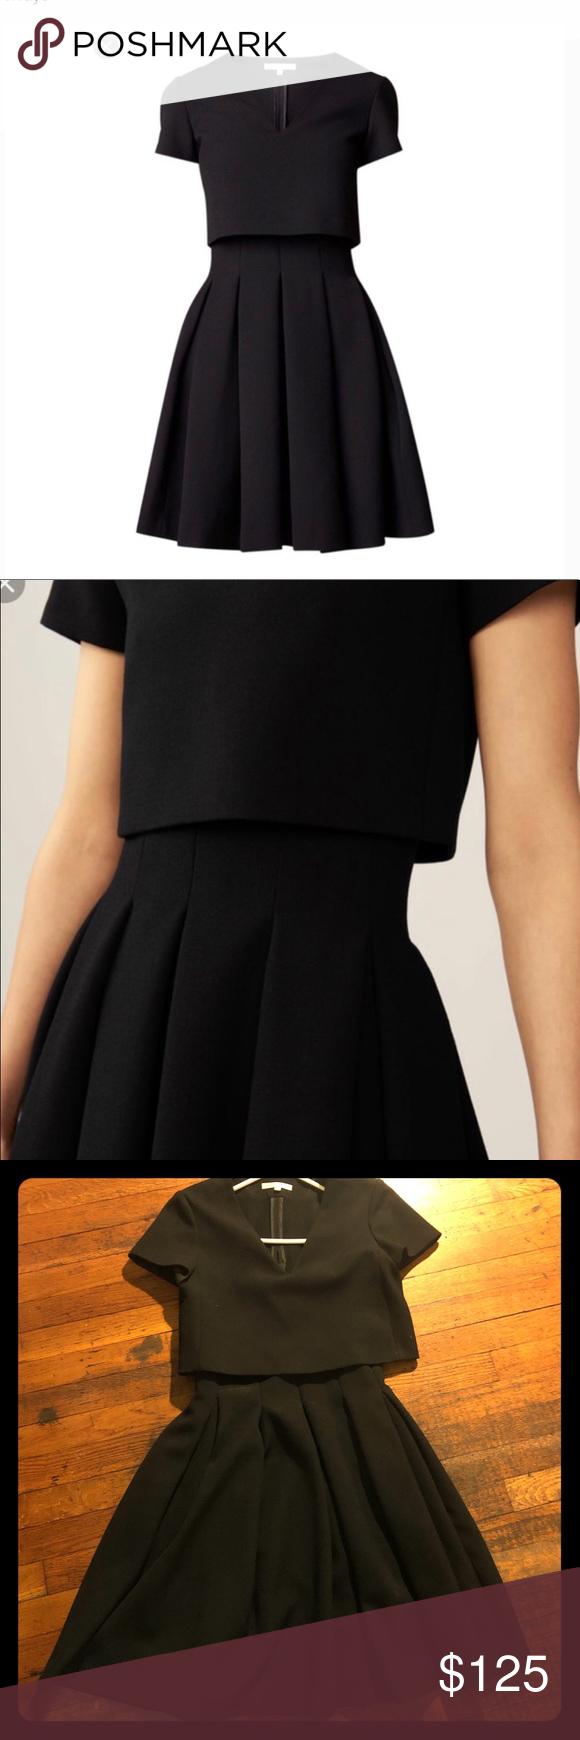 Maje Fit And Flare Little Black Dress Black Dress Little Black Dress Dresses [ 1740 x 580 Pixel ]